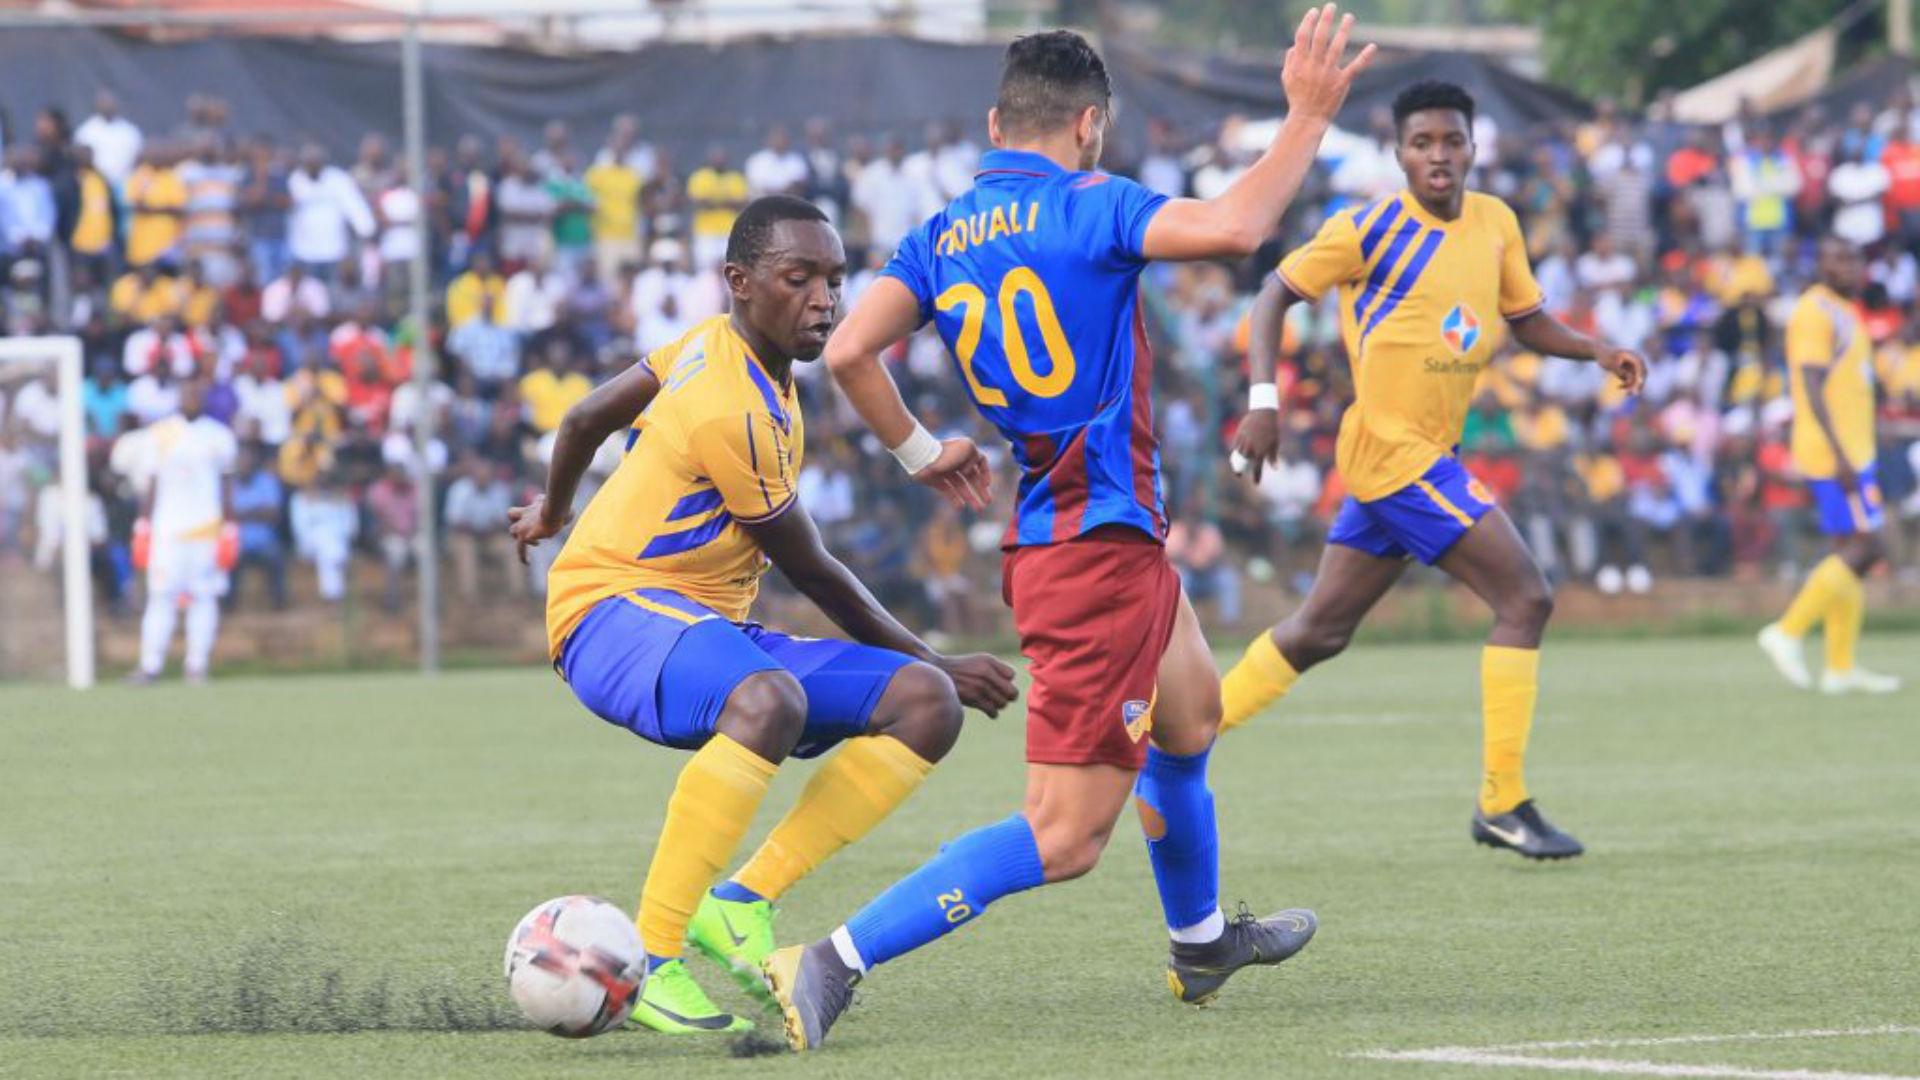 Caf Confederation Cup: KCCA FC will go on the attack in Algeria - Mutebi